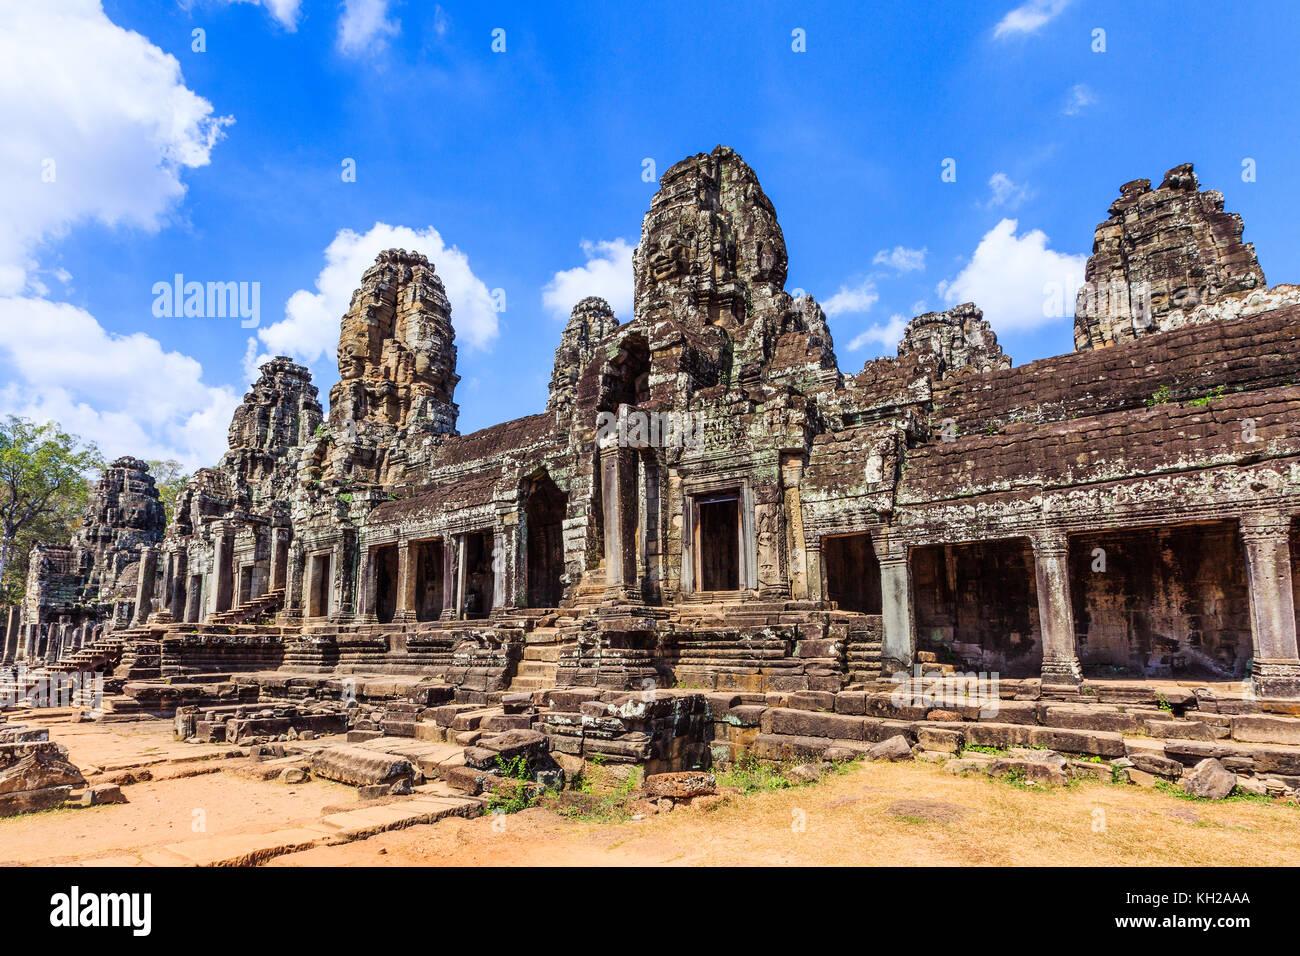 Angkor, Cambodge. La galerie intérieure du temple Bayon. Photo Stock